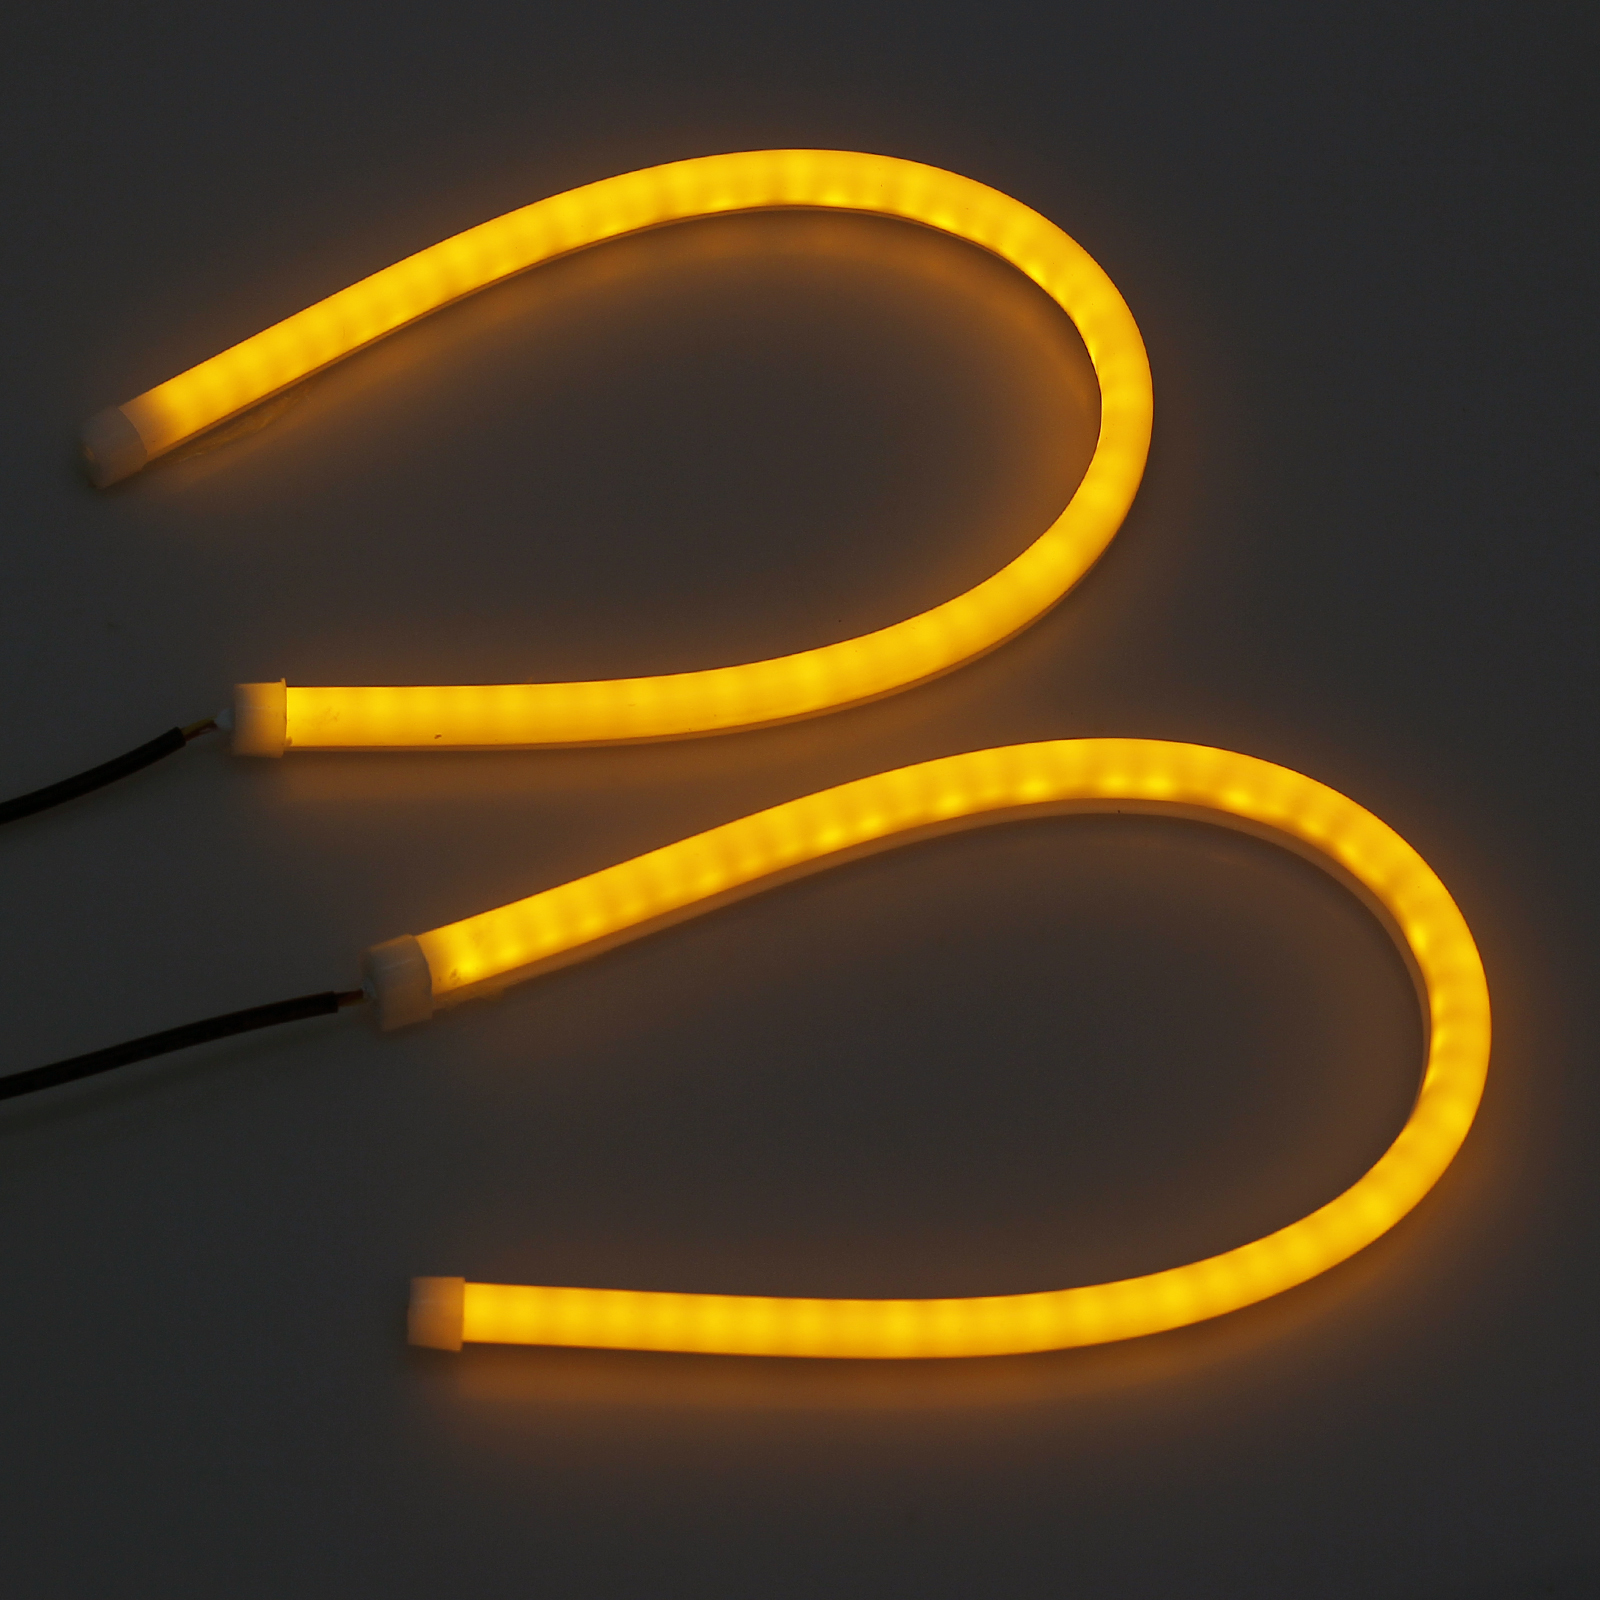 2x 45cm wei amber led auto tagfahrlicht drl strip. Black Bedroom Furniture Sets. Home Design Ideas